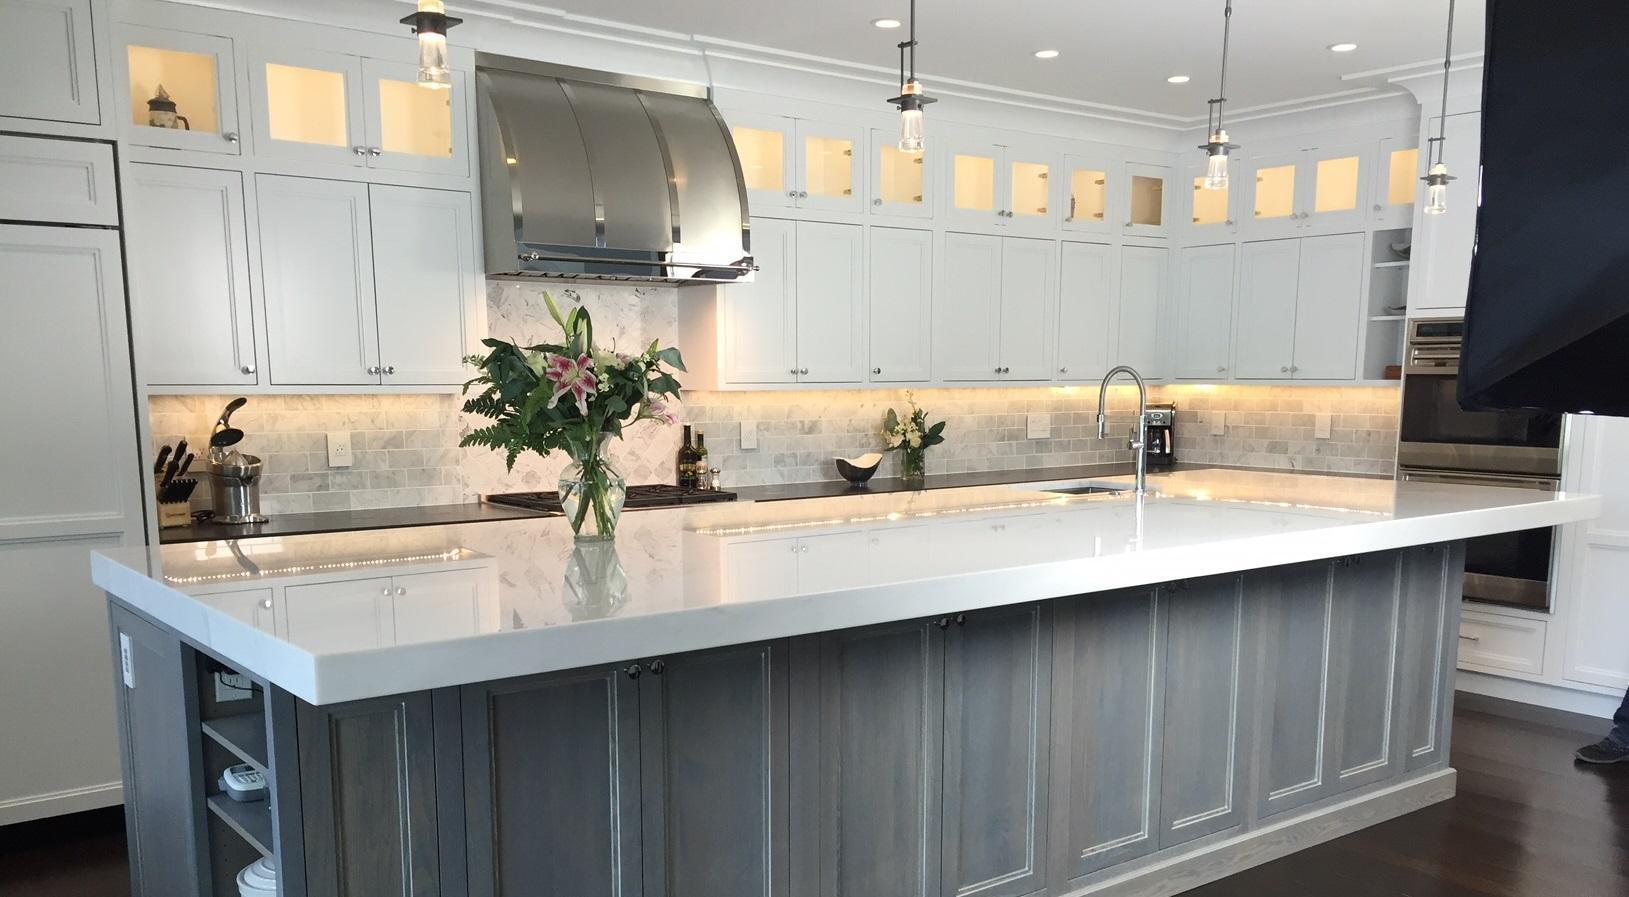 Kitchen Design Ideas | Bathroom Design Ideas | Tile Design Trends ...